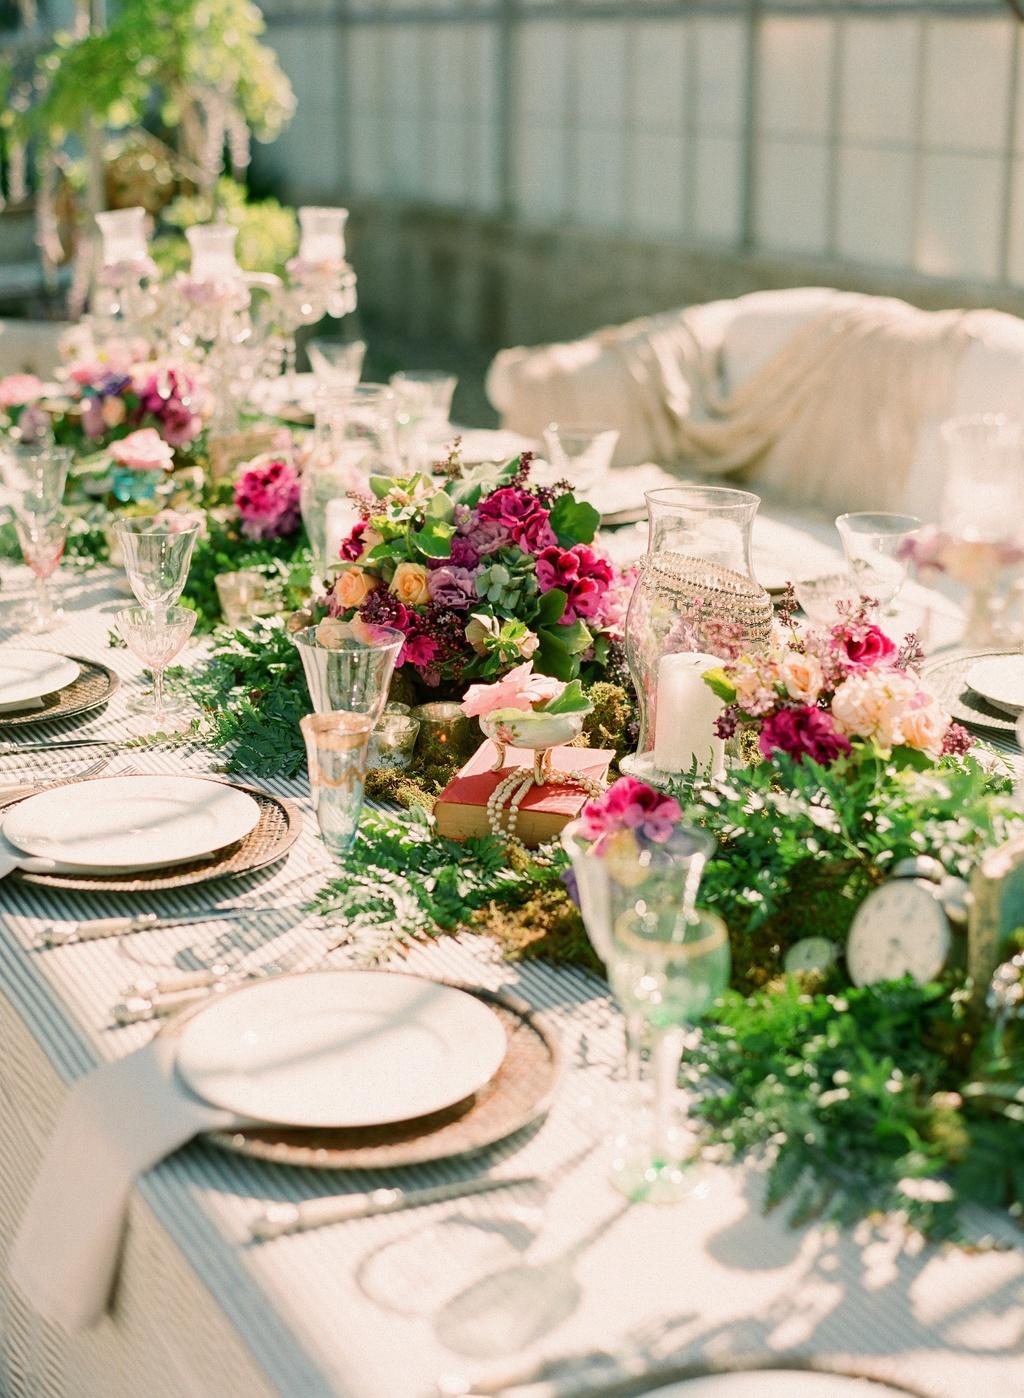 Styled-wedding-beaux-arts-tea-time-monique-lhuillier-santa-barbara-chic-flowers-table-setting-24.full